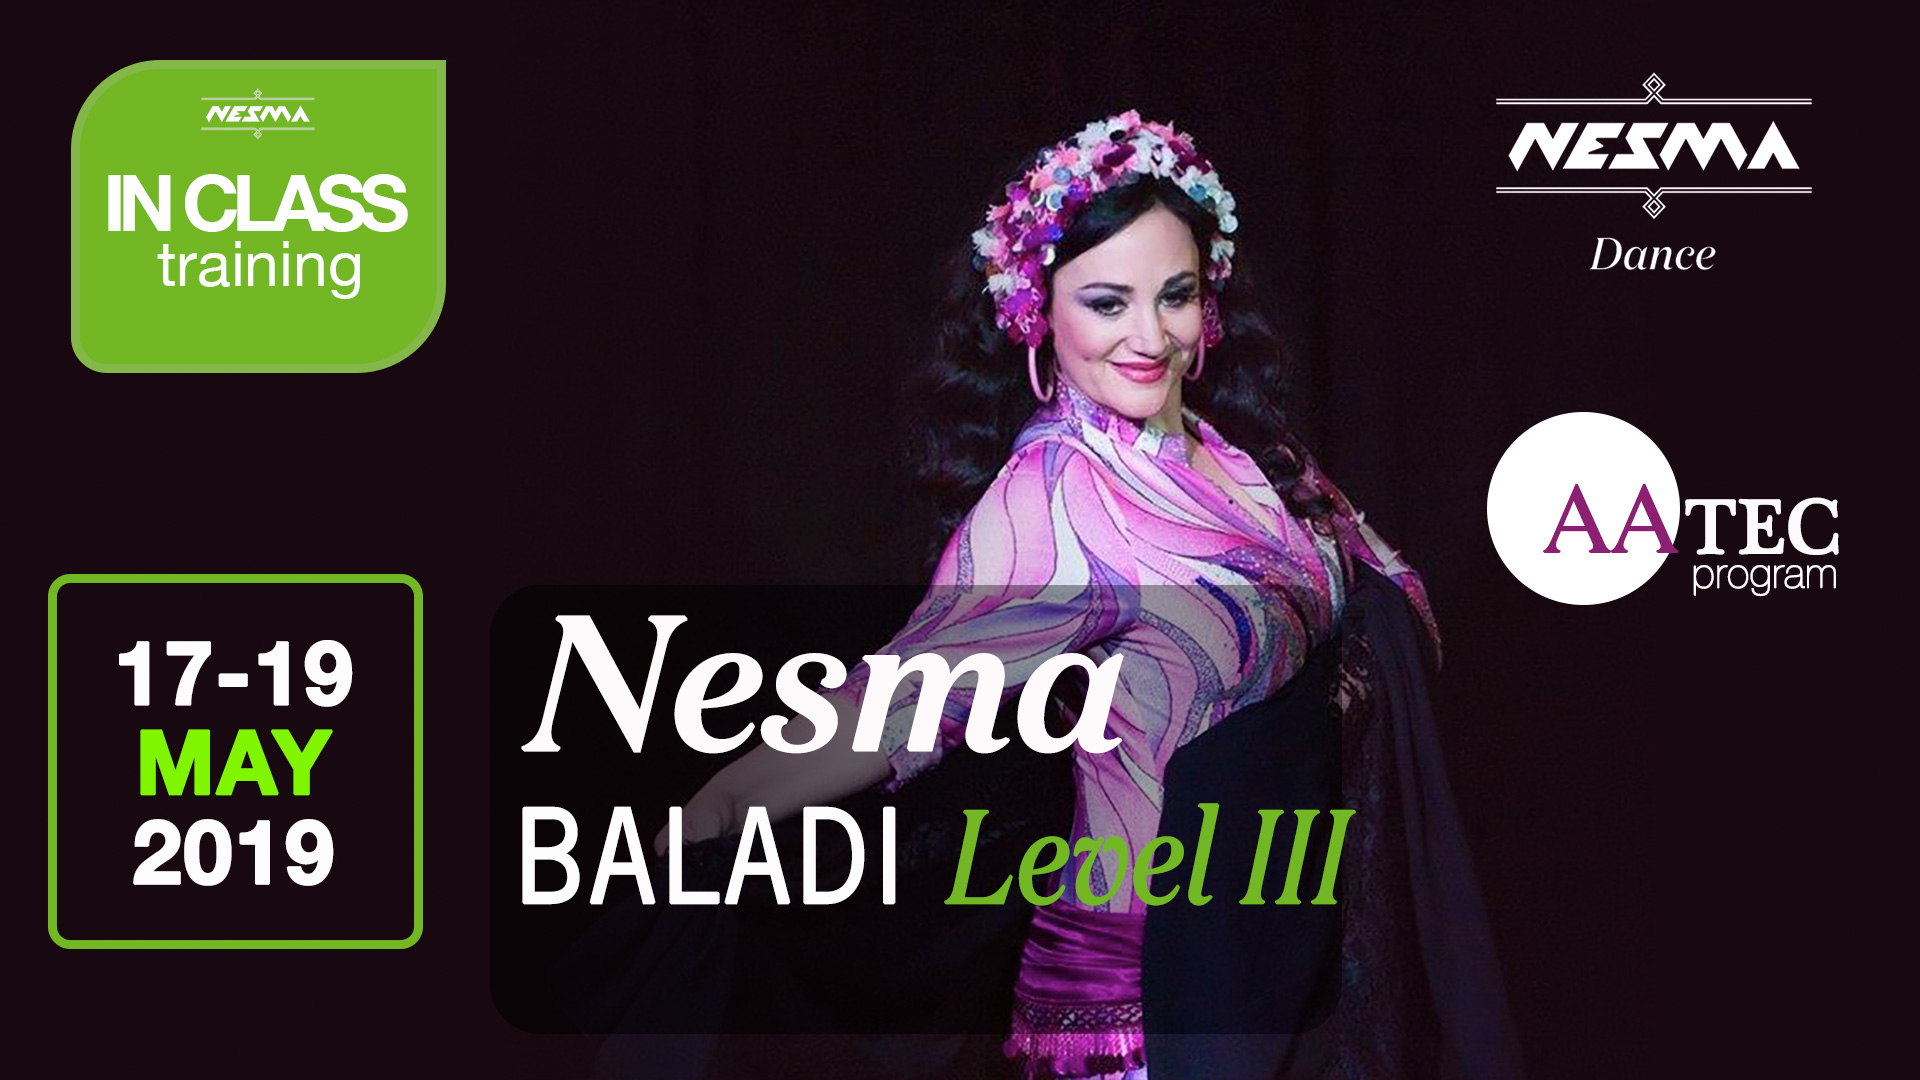 Nesma Baladi Course level 3 AATEC program